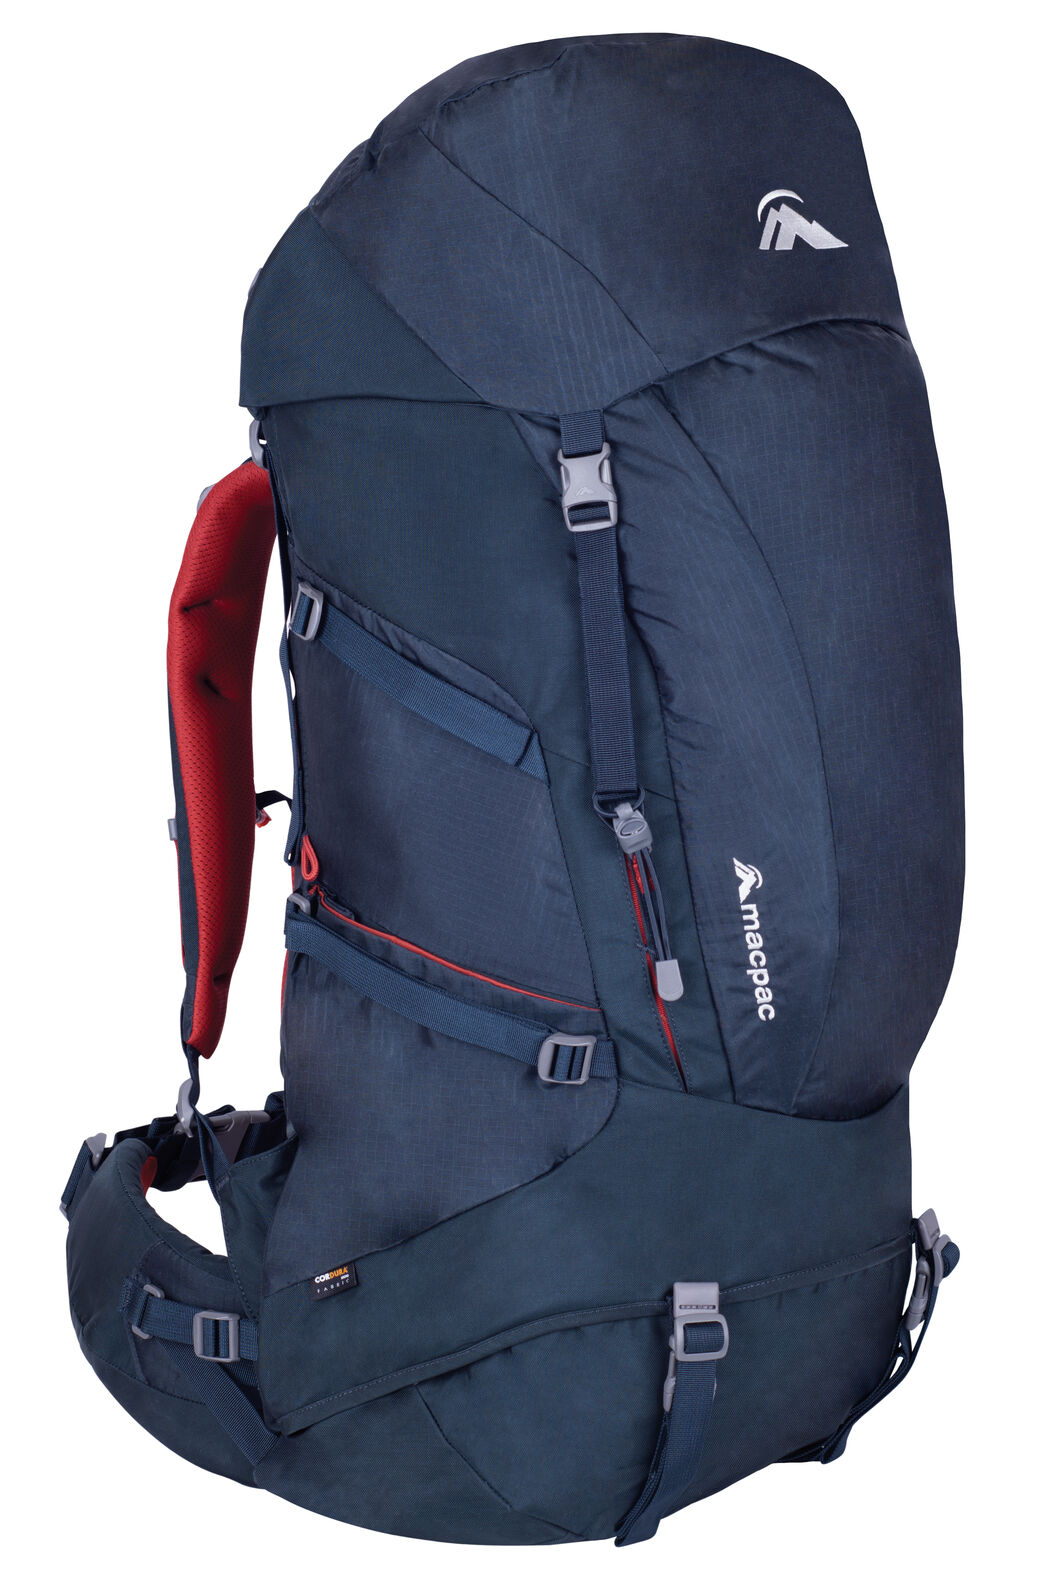 Macpac Torlesse 65L Pack V2, Carbon, hi-res